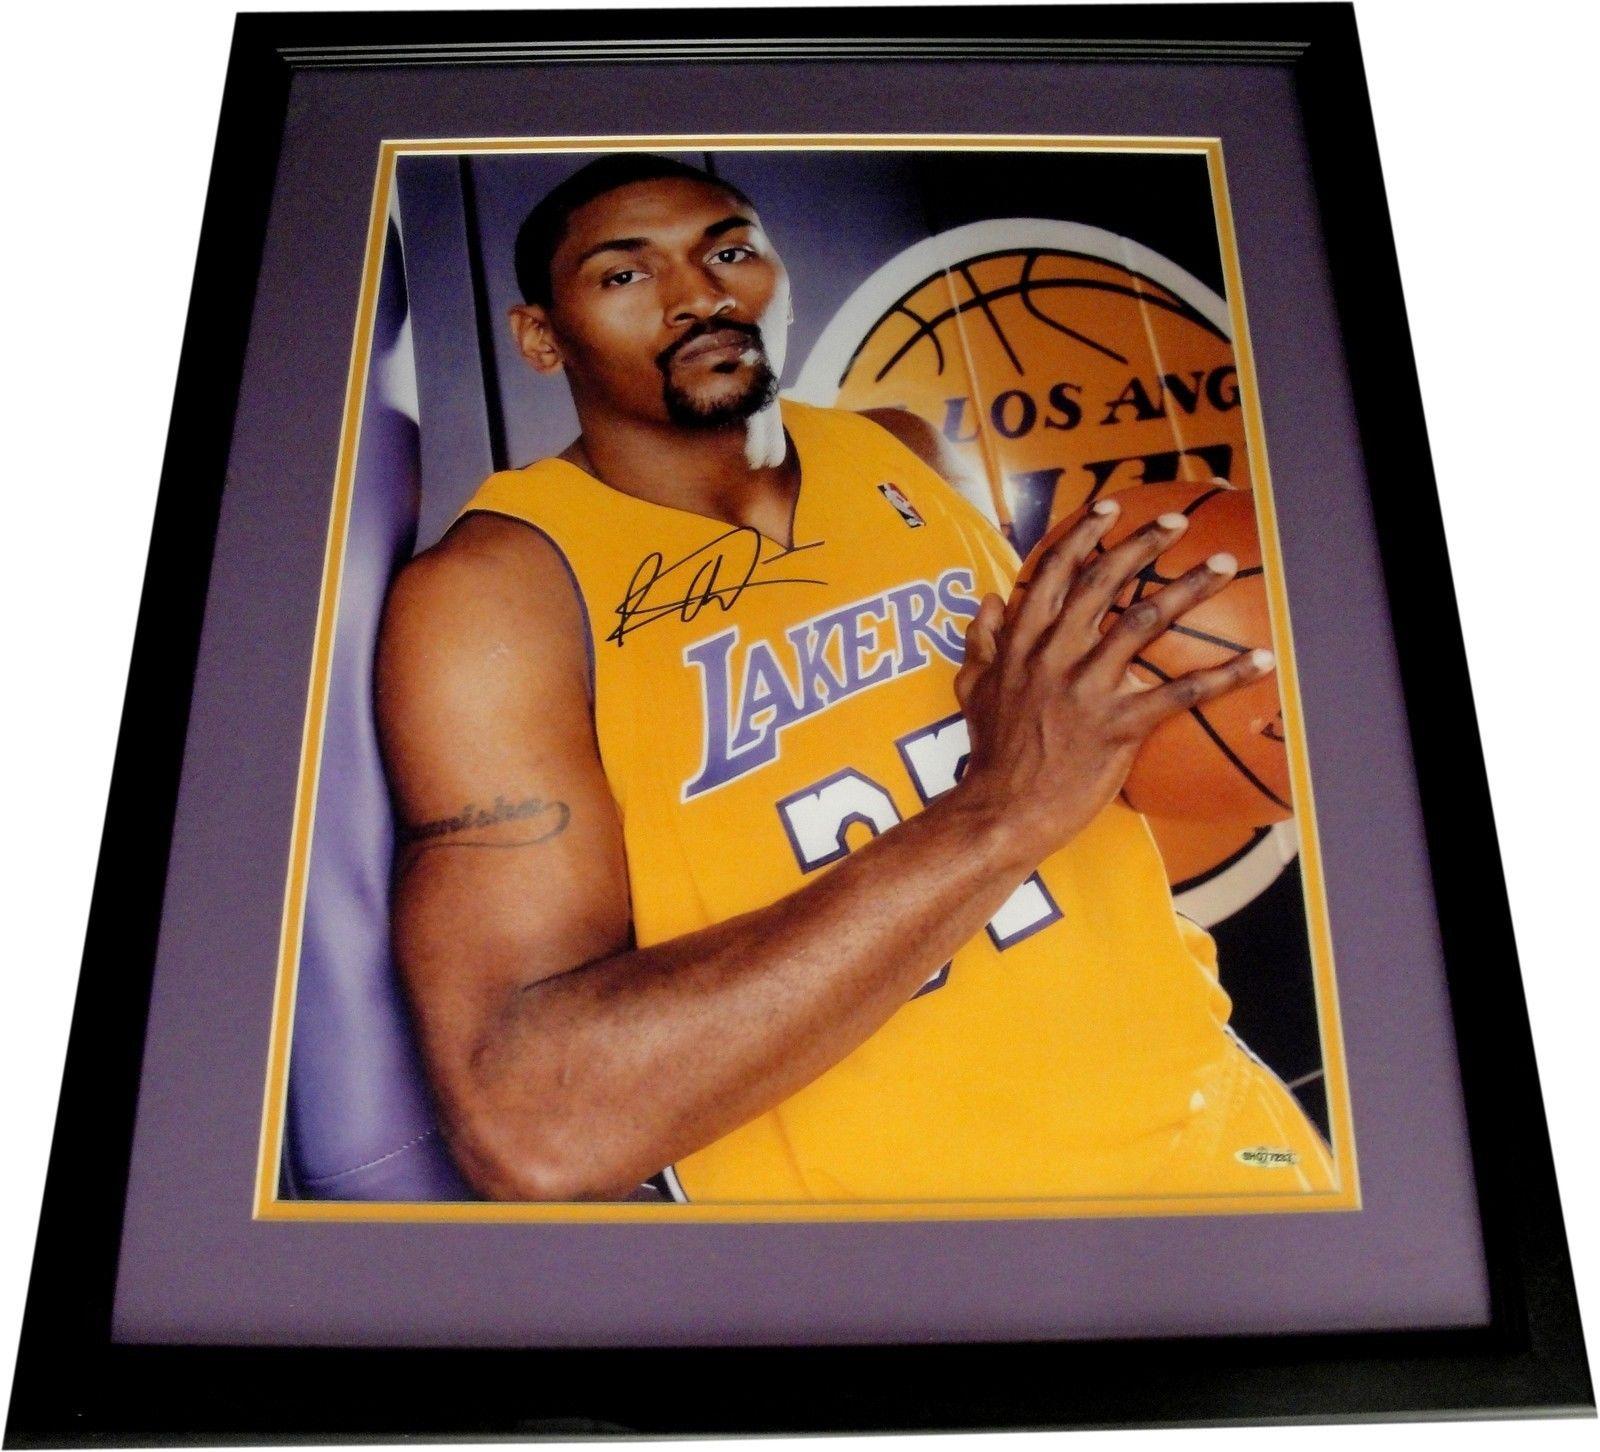 8fde9b133f6e Metta World Peace Signed Autographed 16X20 Photo Custom Framed Ron ...